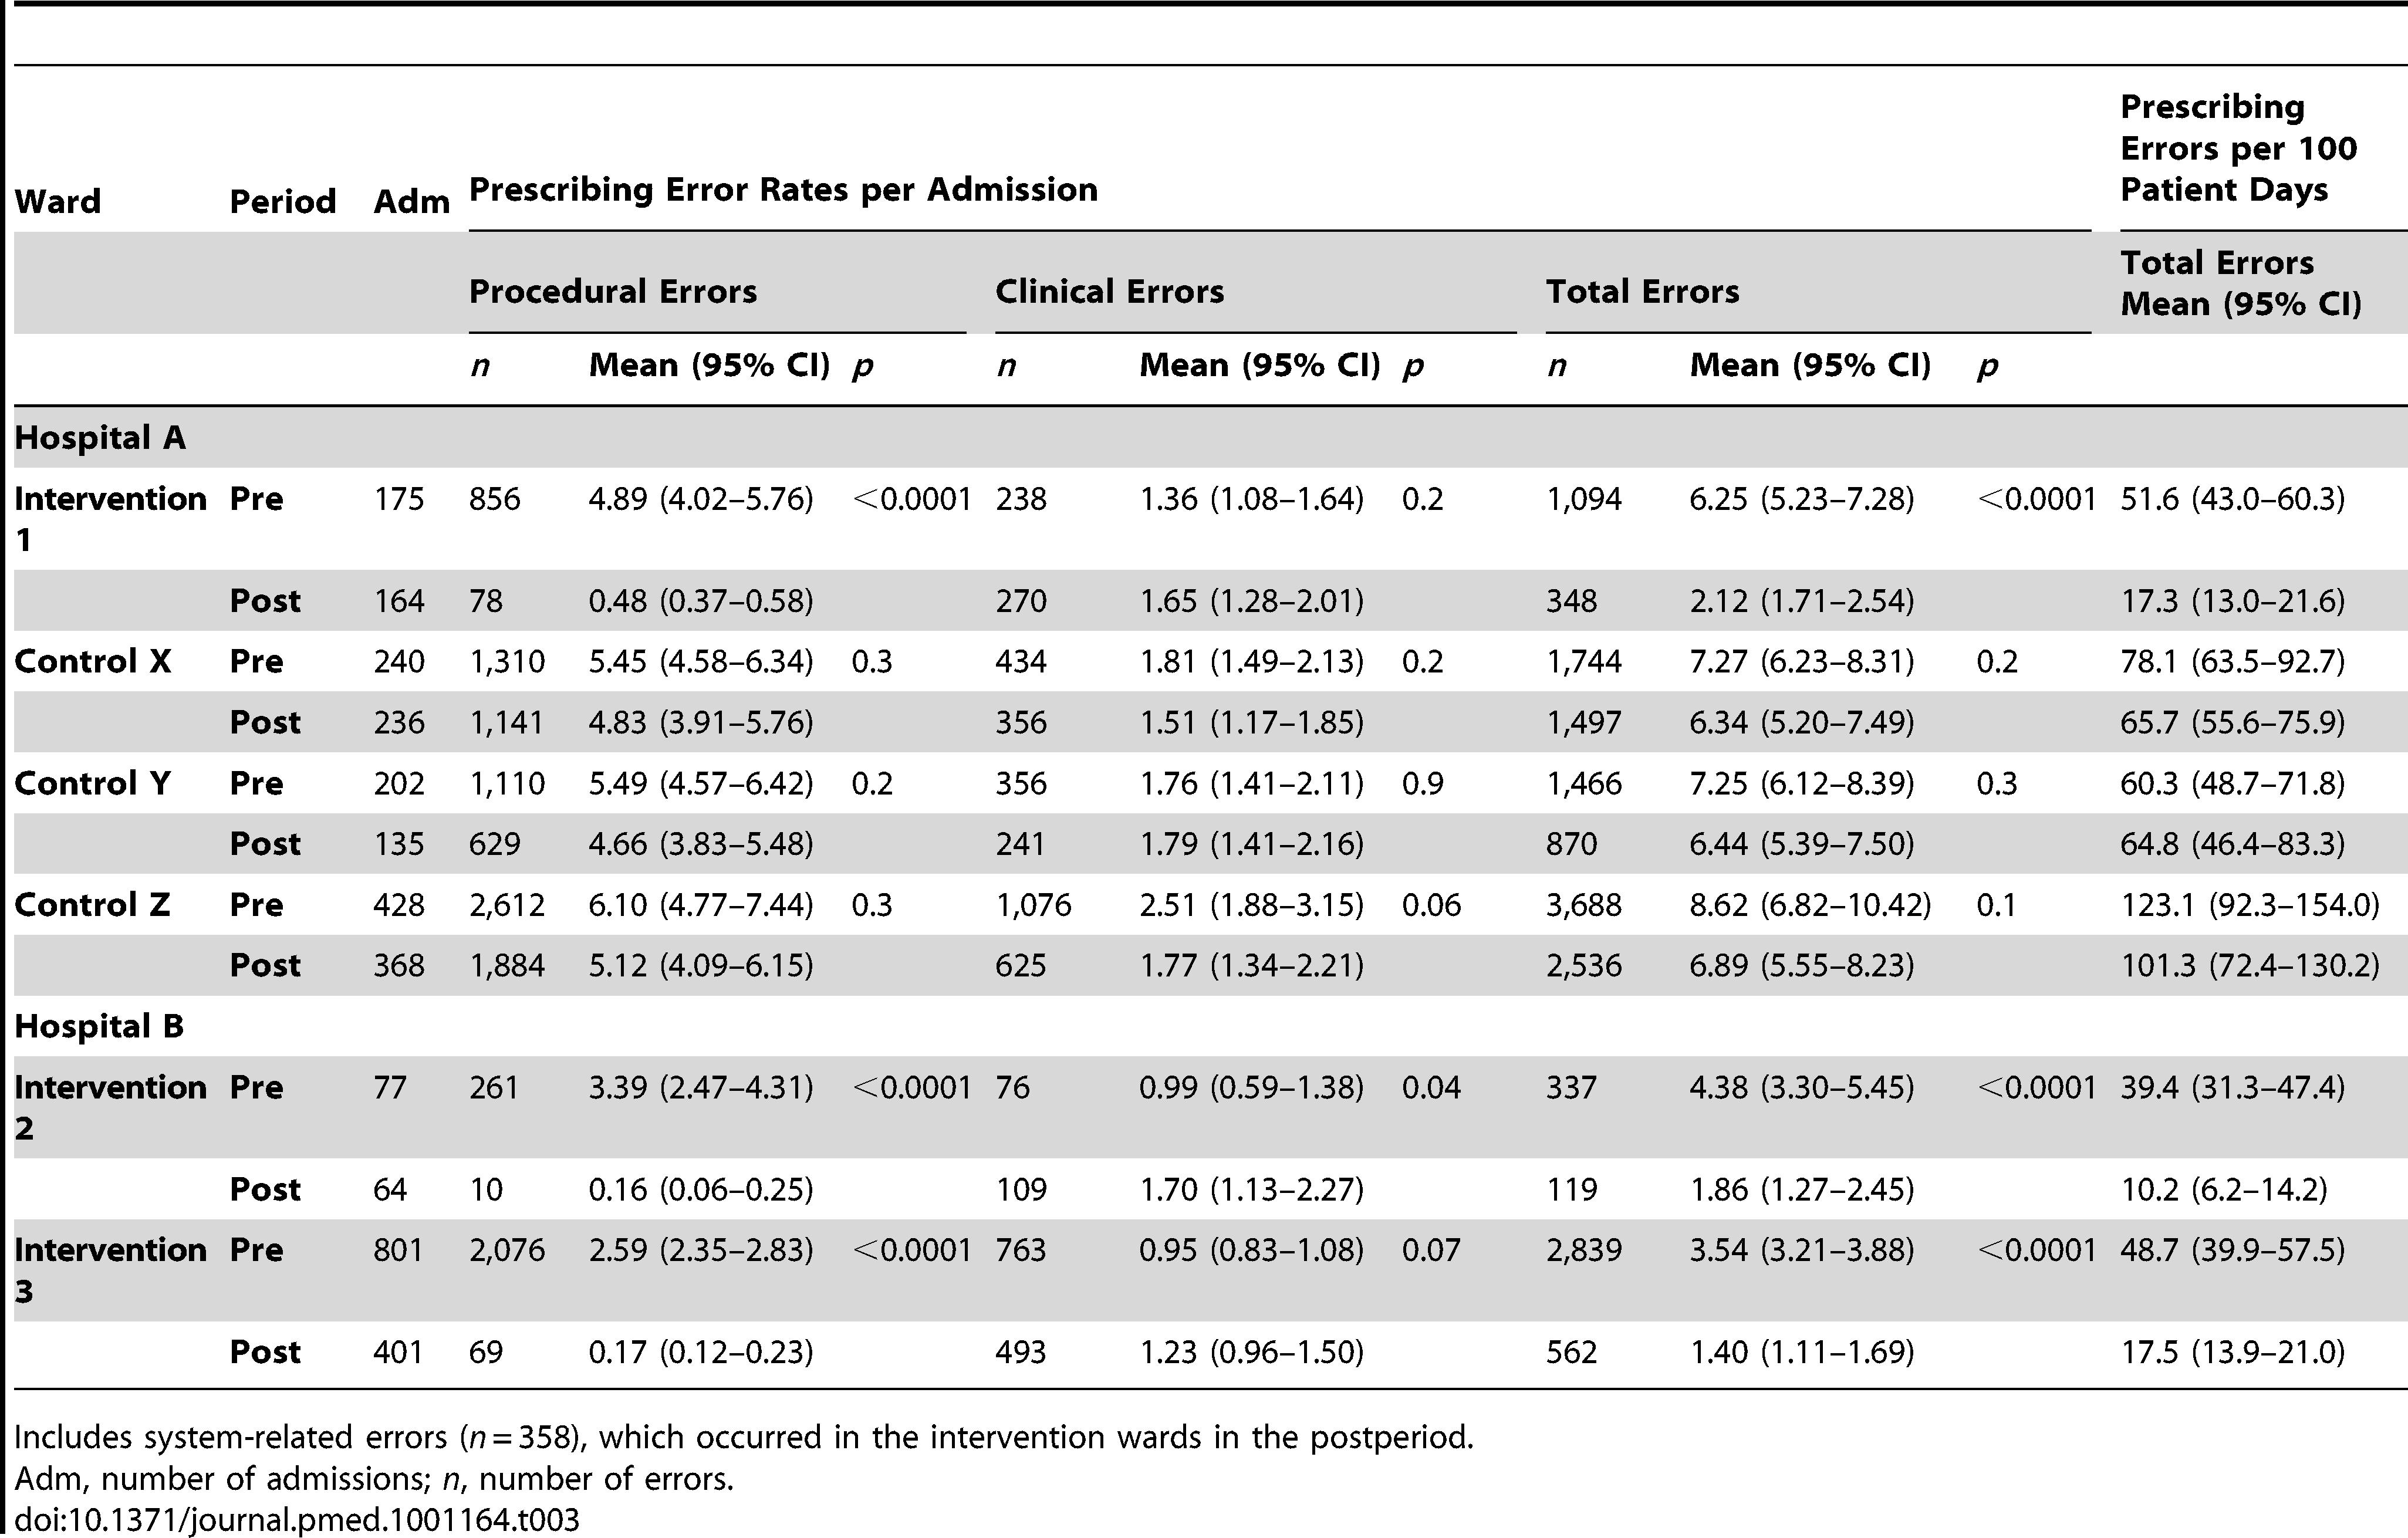 Comparison of prescribing error rates pre- and postelectronic prescribing system implementation.